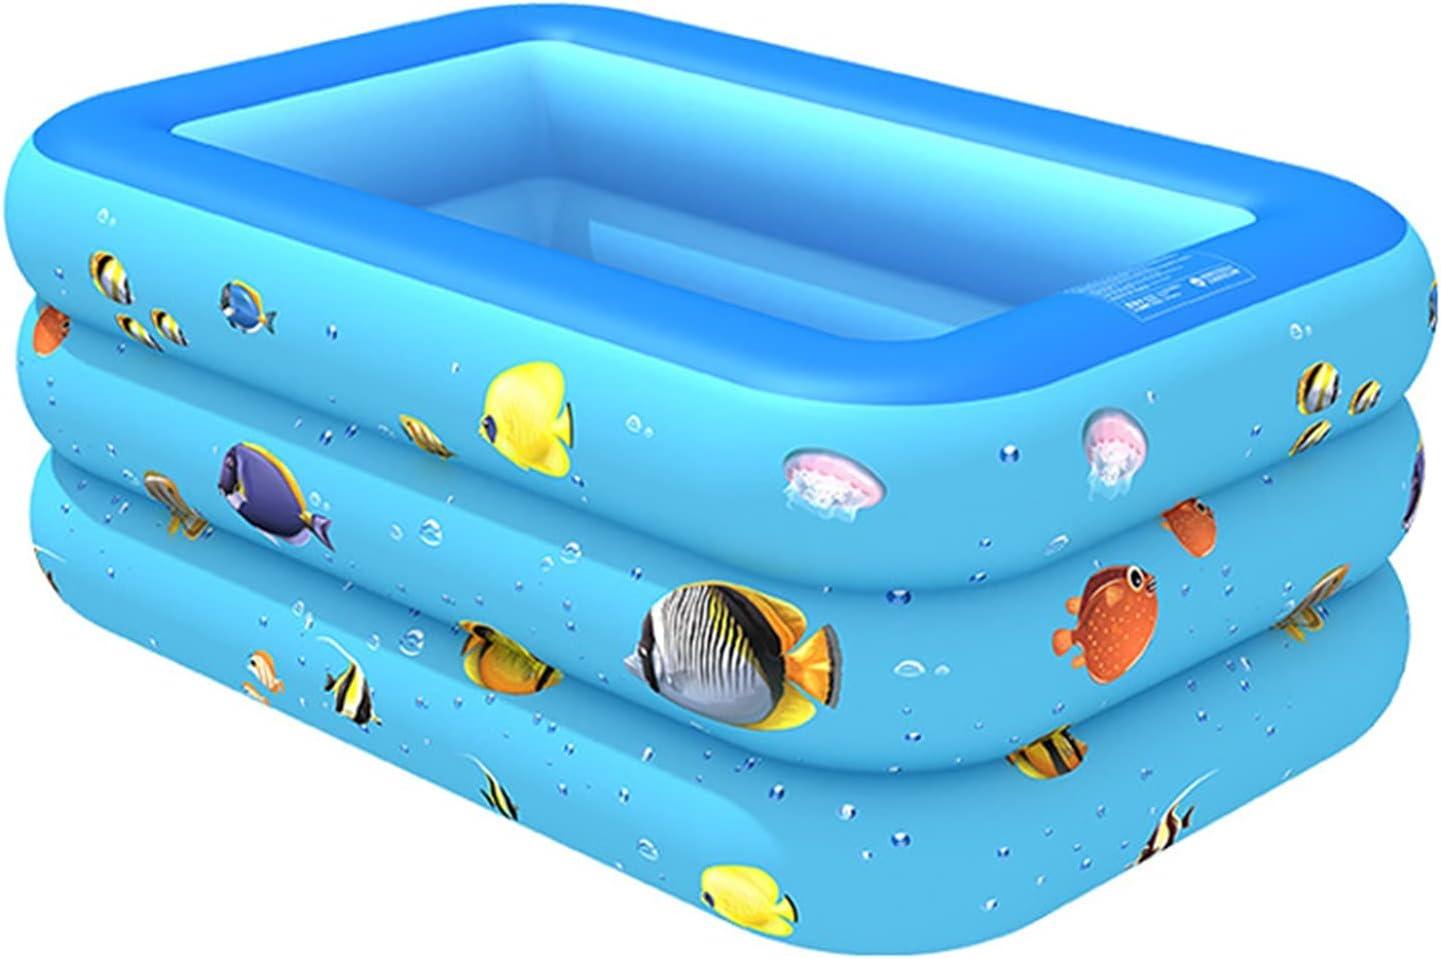 ZXQZ Kayak Piscina, Salón Inflable sobre La Piscina de Tierra, Piscinas Infantiles Rectangulares para Patio Trasero, Jardín, Fiesta Acuática de Verano (Color : Blue, Size : 210cm)